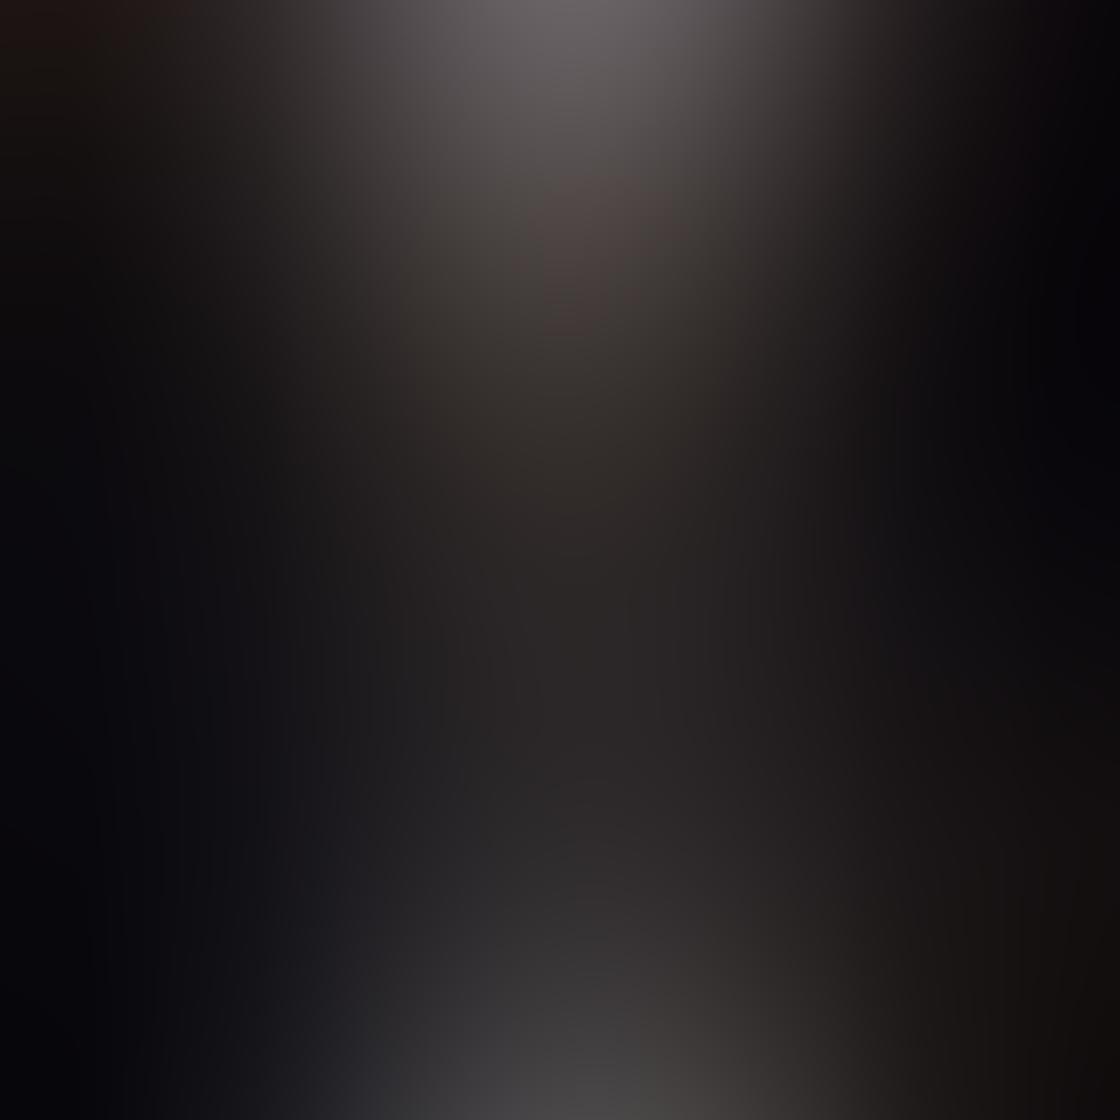 Shadow iPhone Photos 22